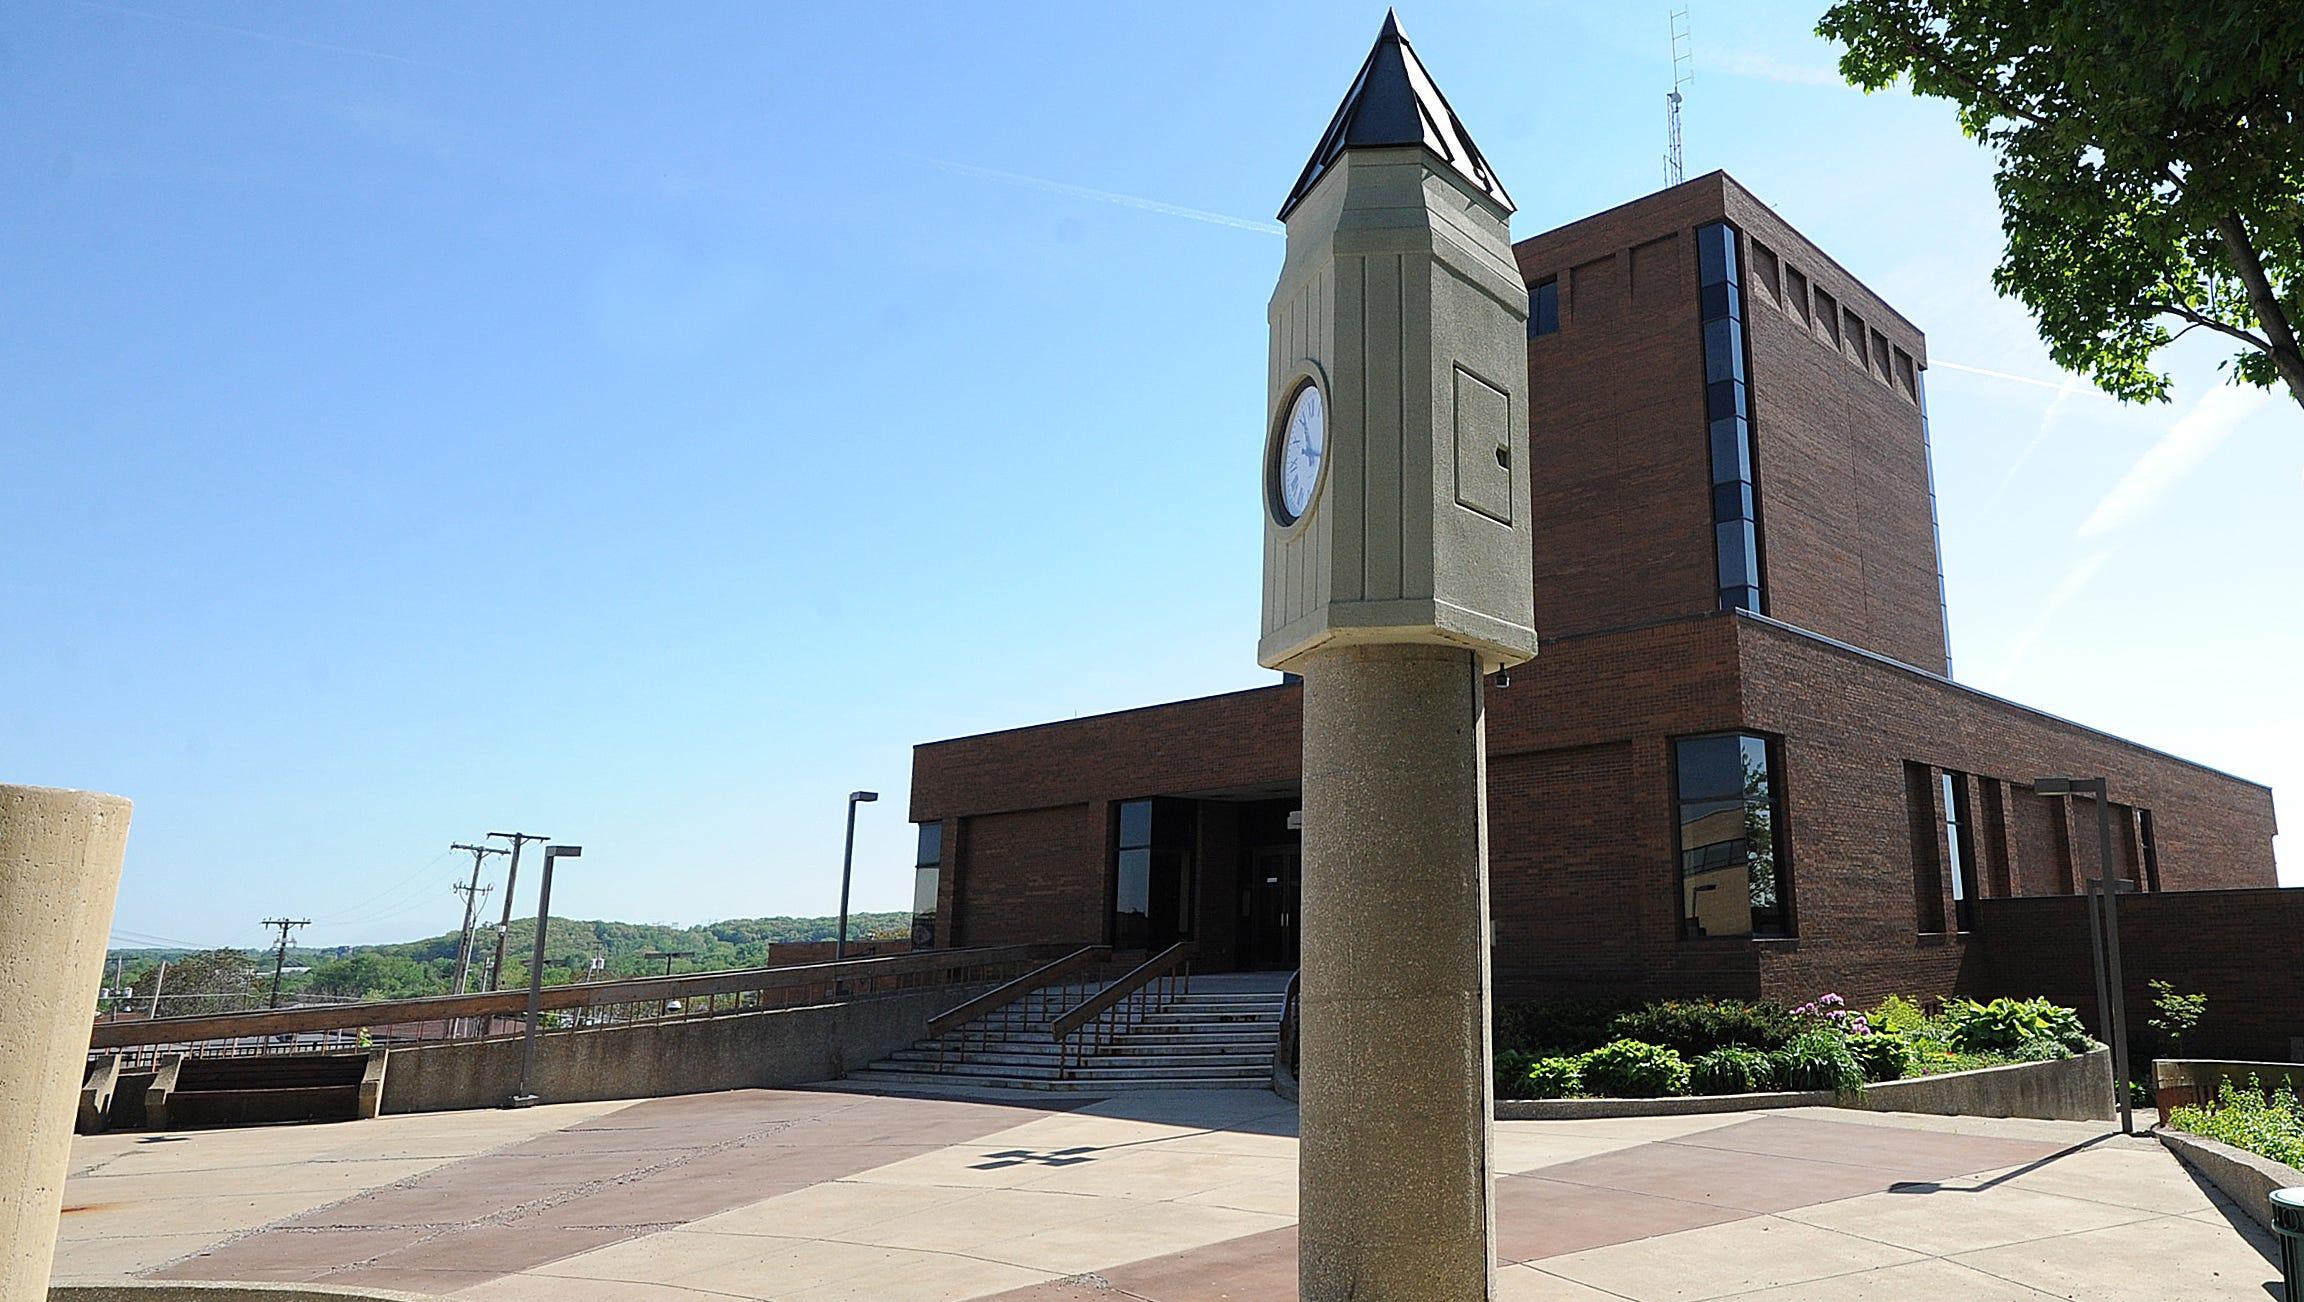 636004746935084223 MNJ Mansfield Municipal Building stock 2 jpg?width=2304&height=1302&fit=crop&format=pjpg&auto=webp.'